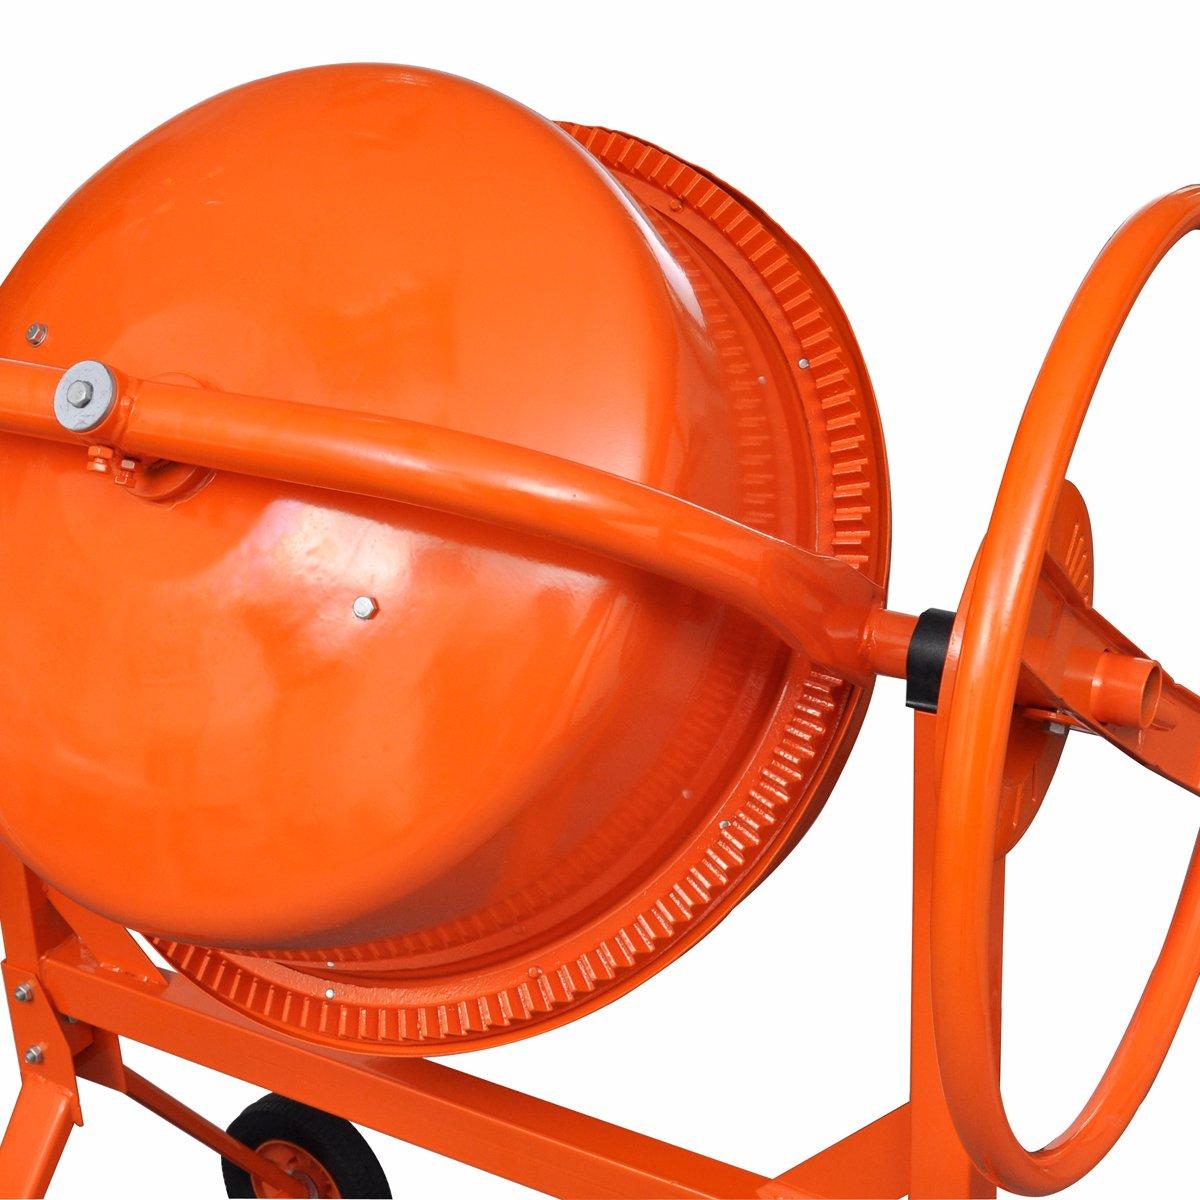 vidaXL Betonmischer 140L Betonmischmaschine M/örtel Mischmaschine Zementmischer